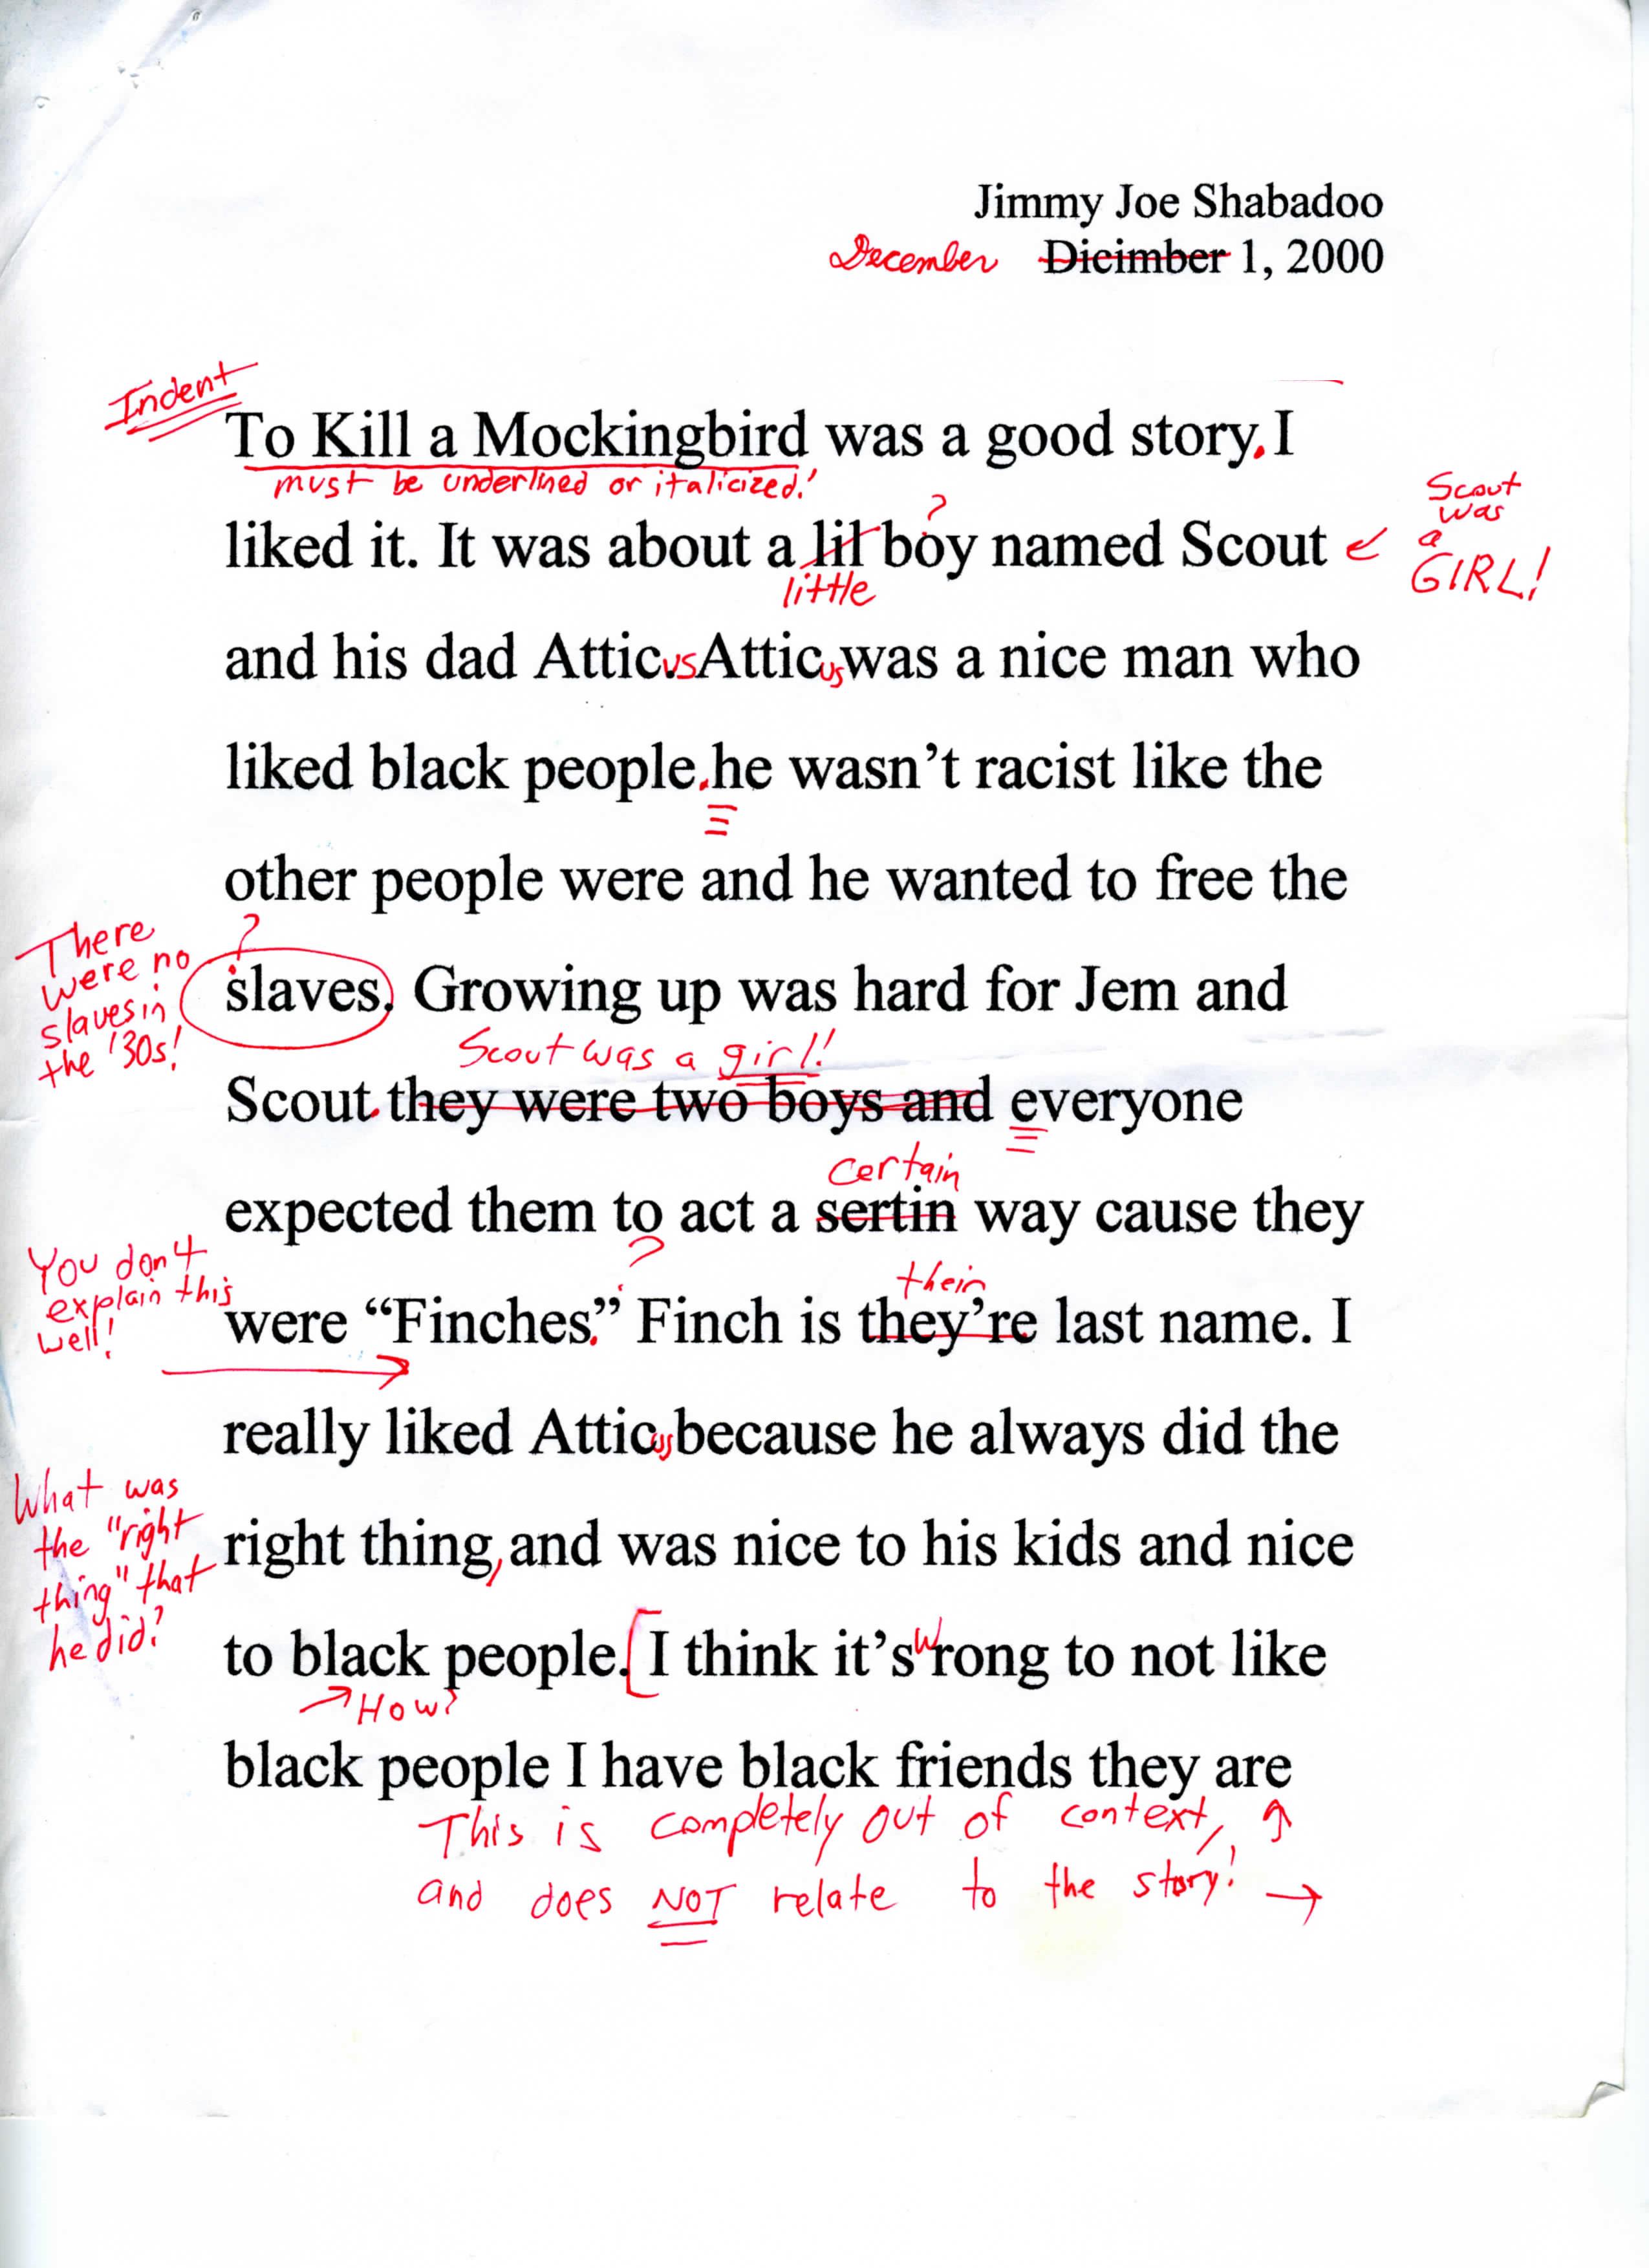 023 To Kill Mockingbird Parody Paper Essay Example Satire Fearsome Essays Satirical Topics For High School Examples On Gun Control Full